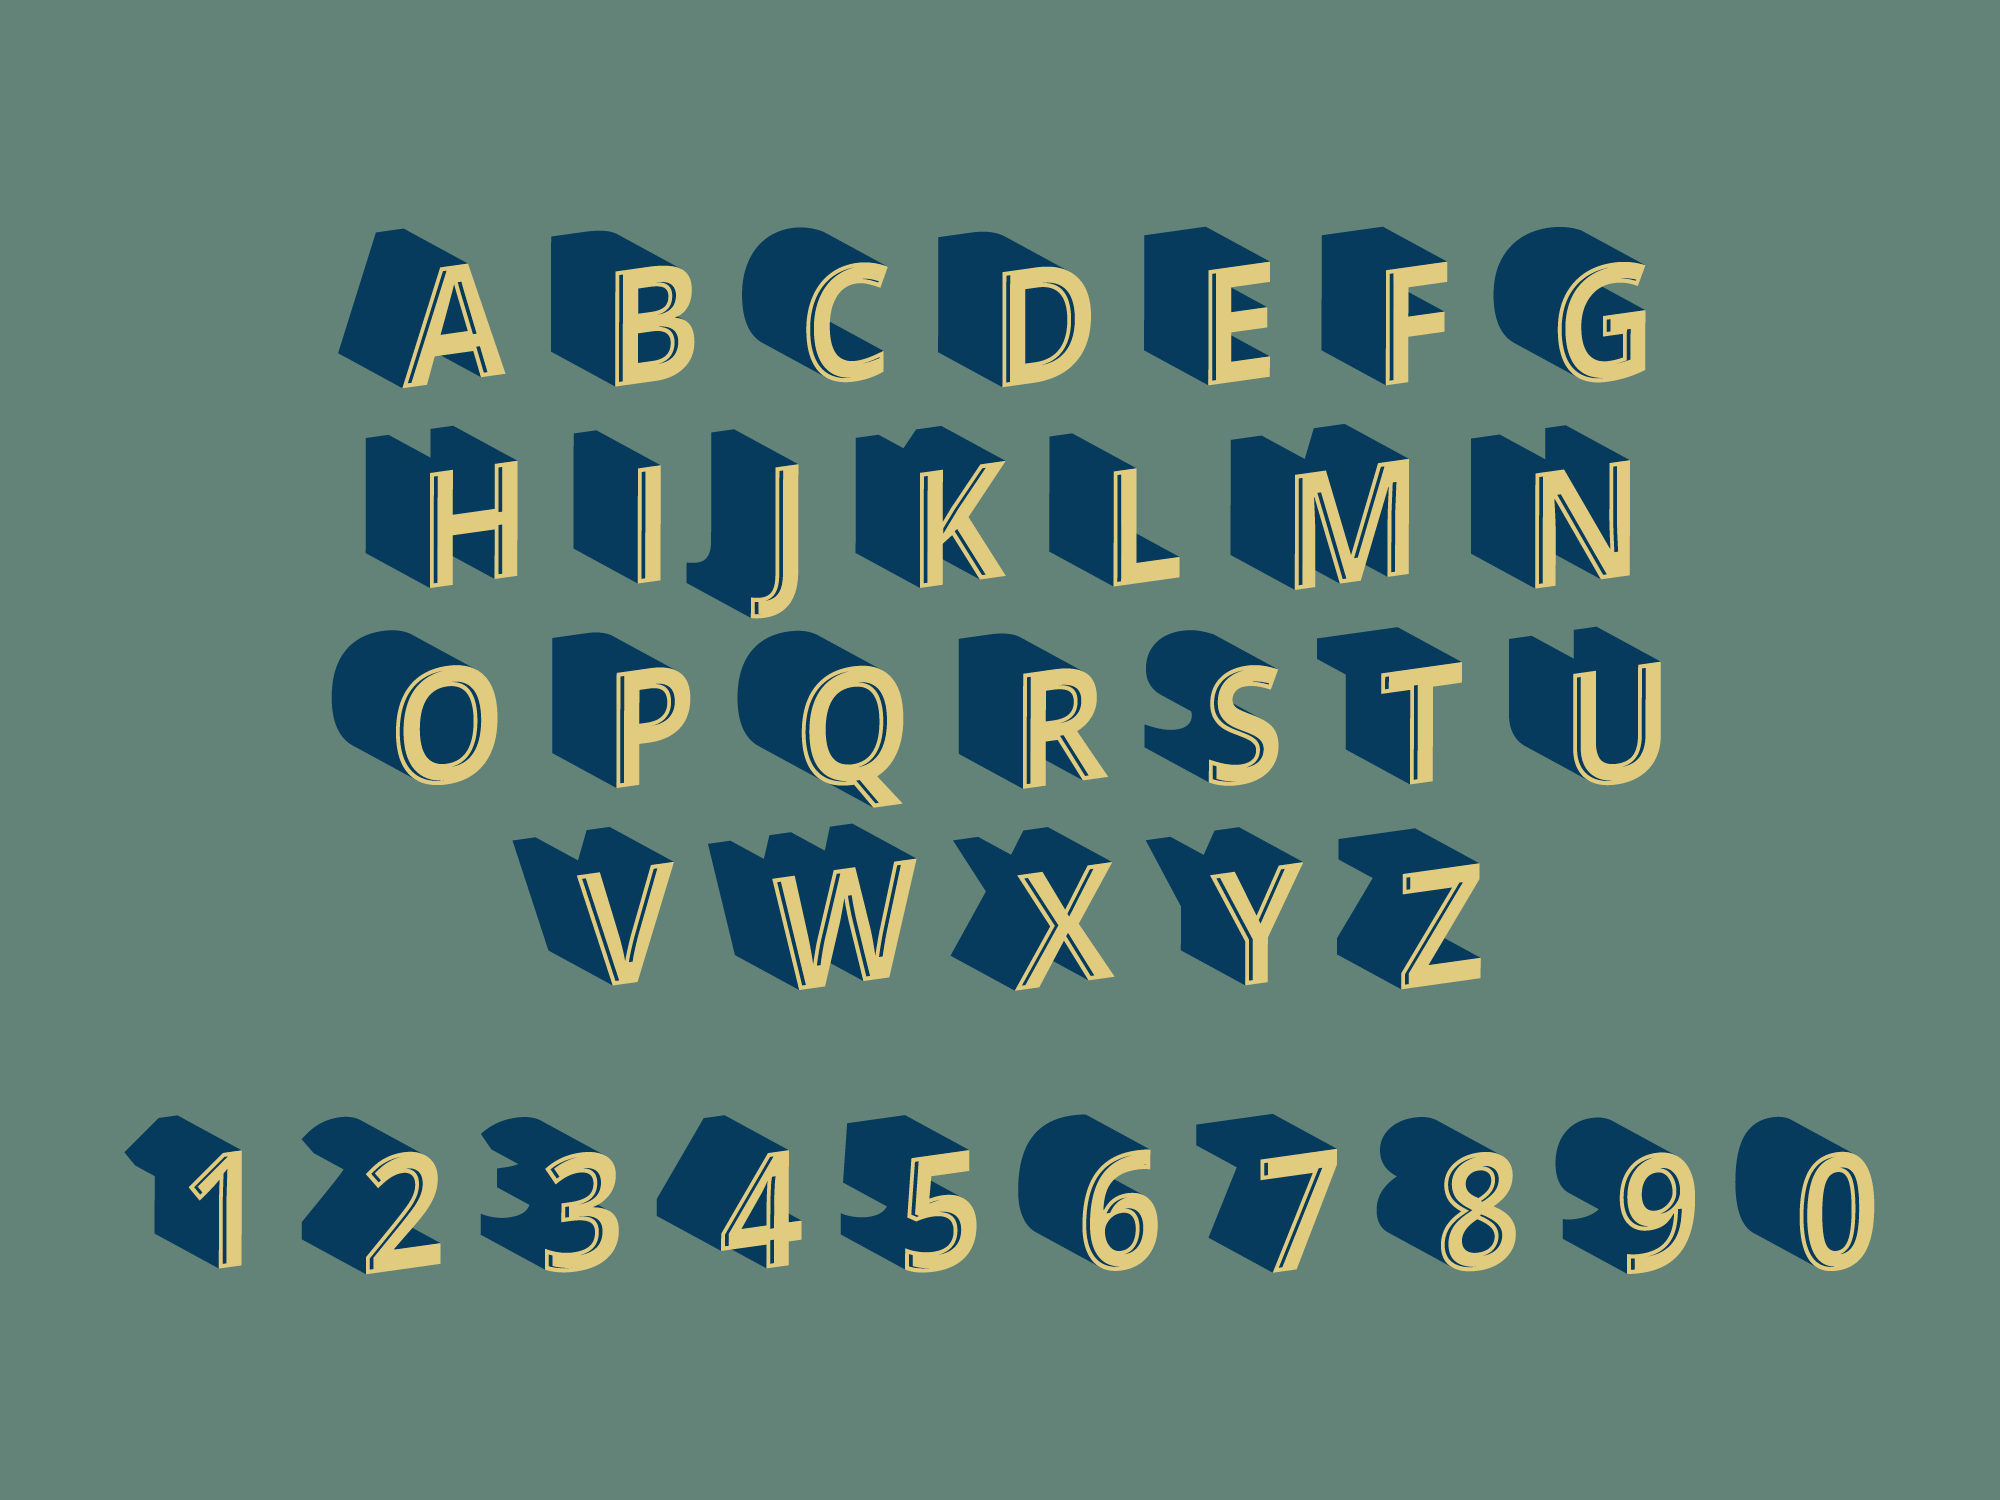 Download 3D Fonts Vector In Retro Style - Download Free Vectors ...